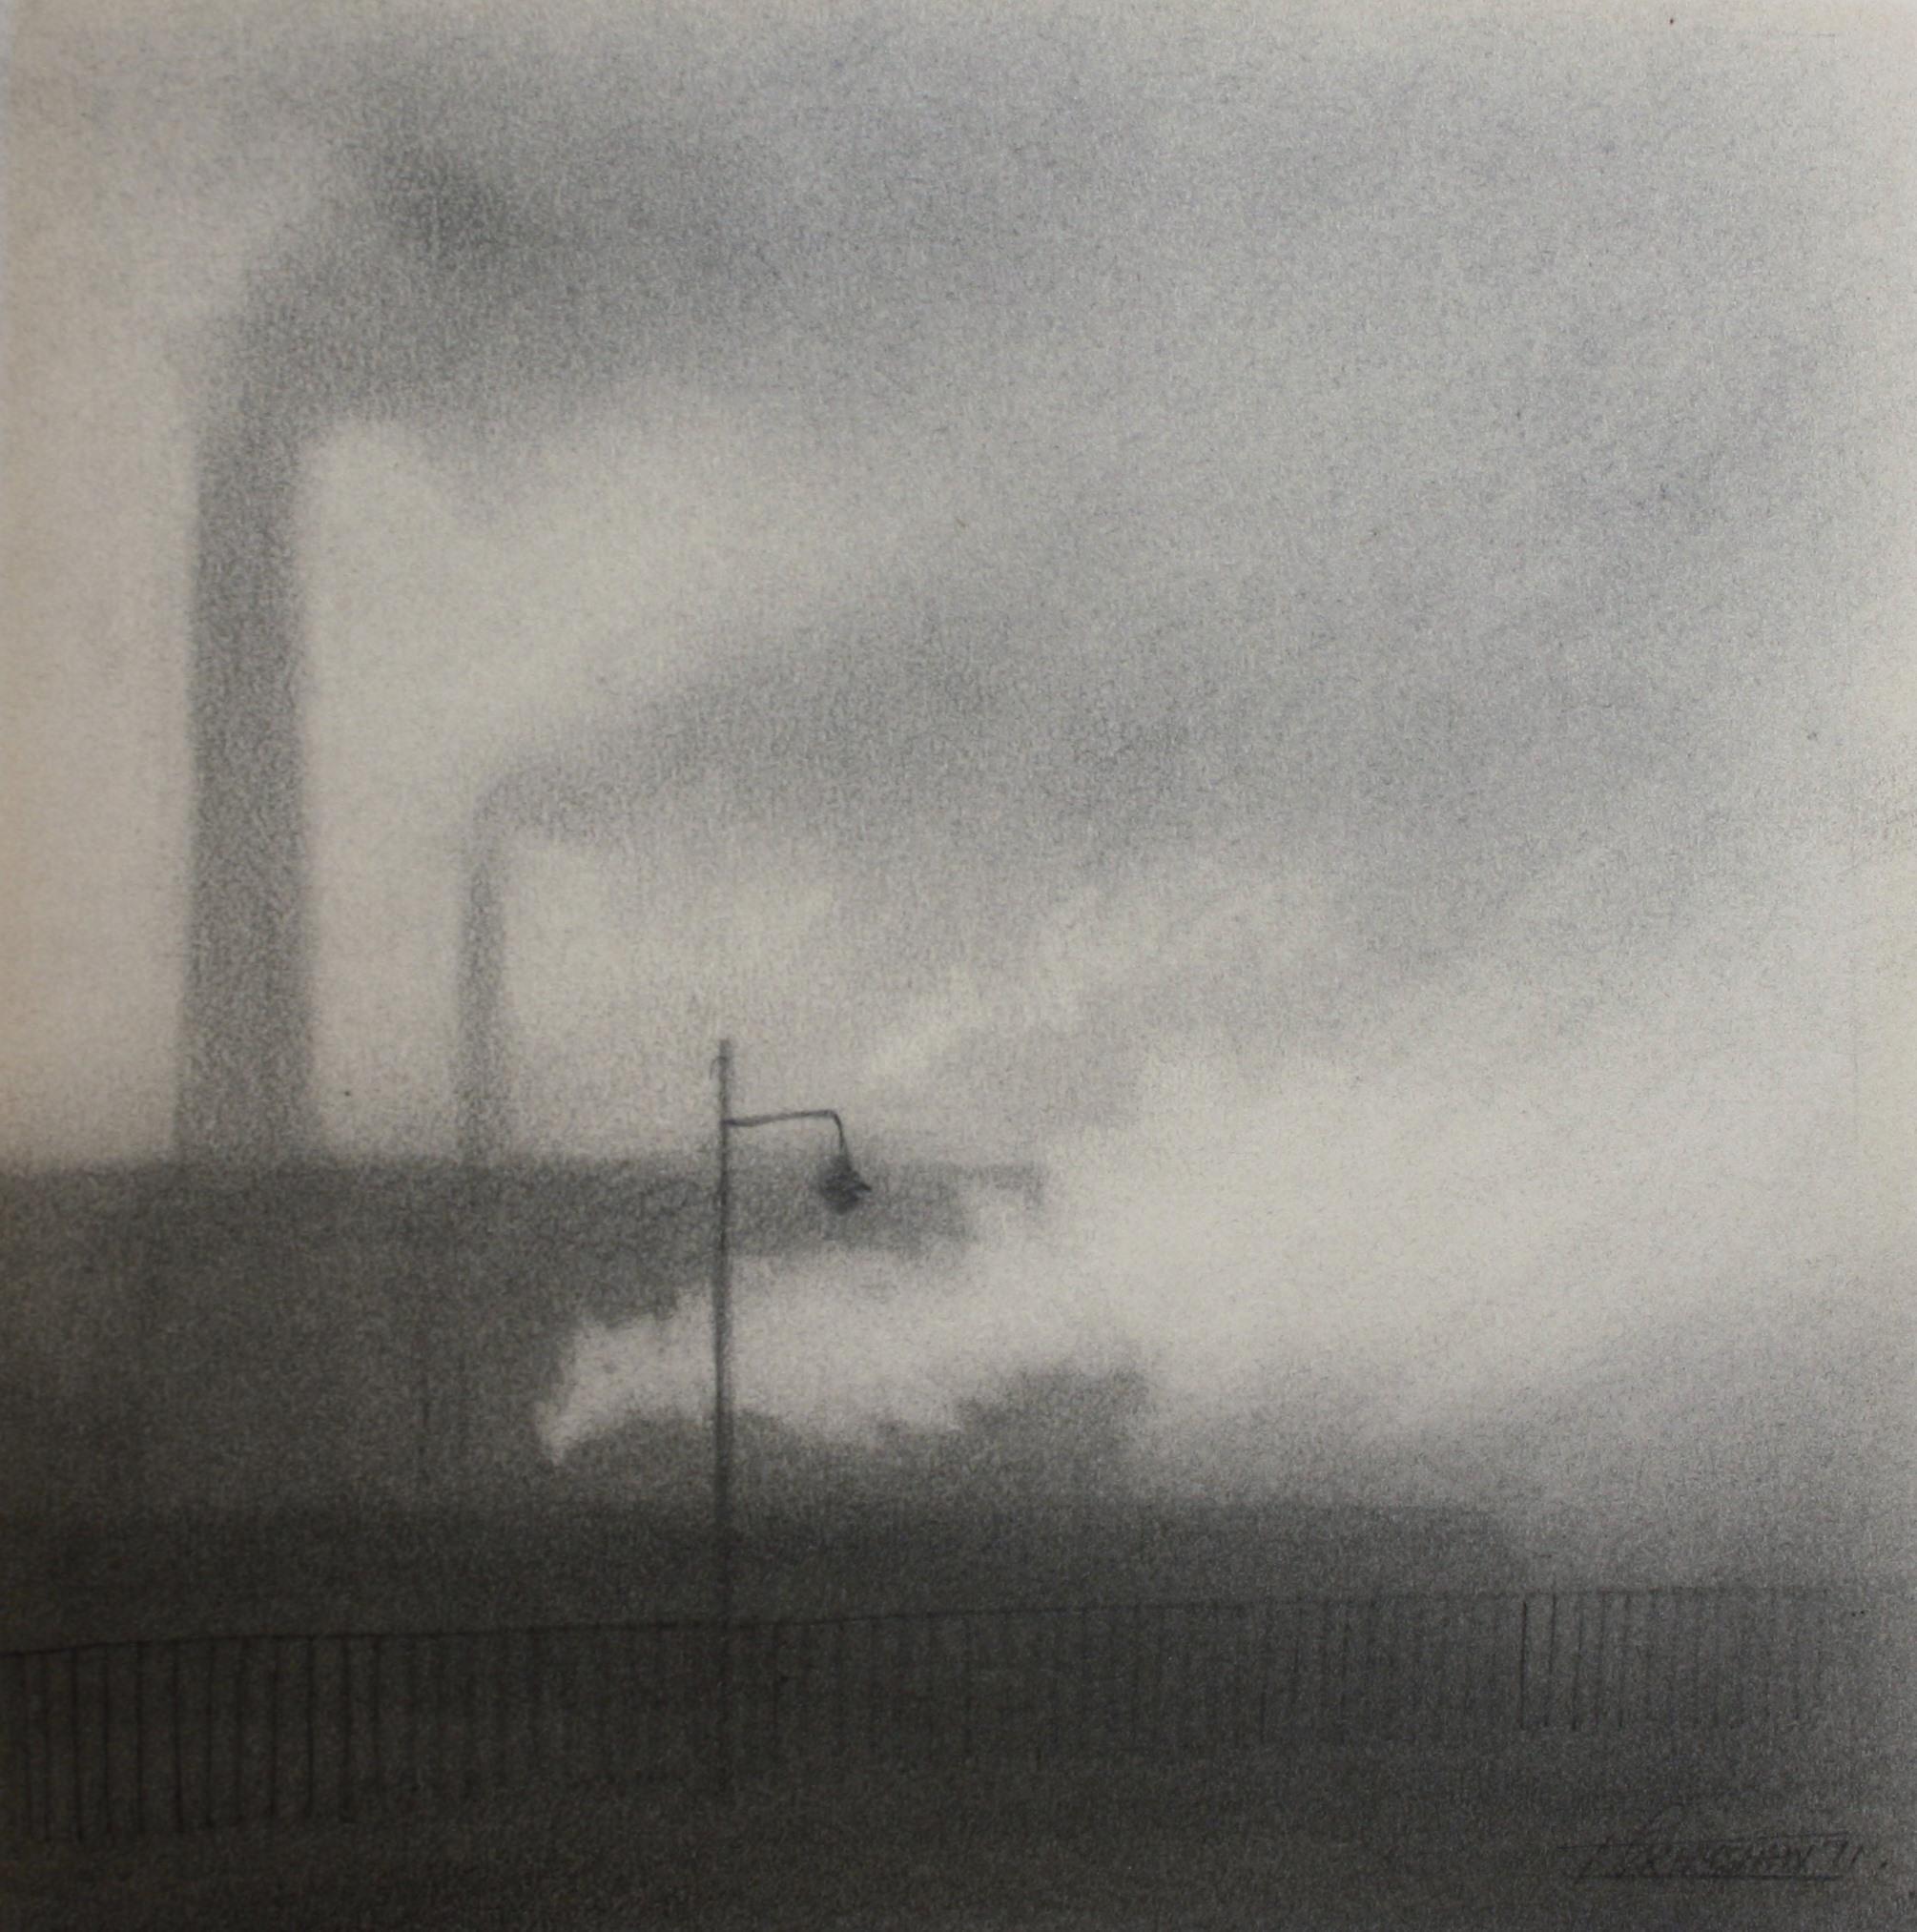 trevor grimshaw pencil smoke & steam 6.5ins x 6ins 1675